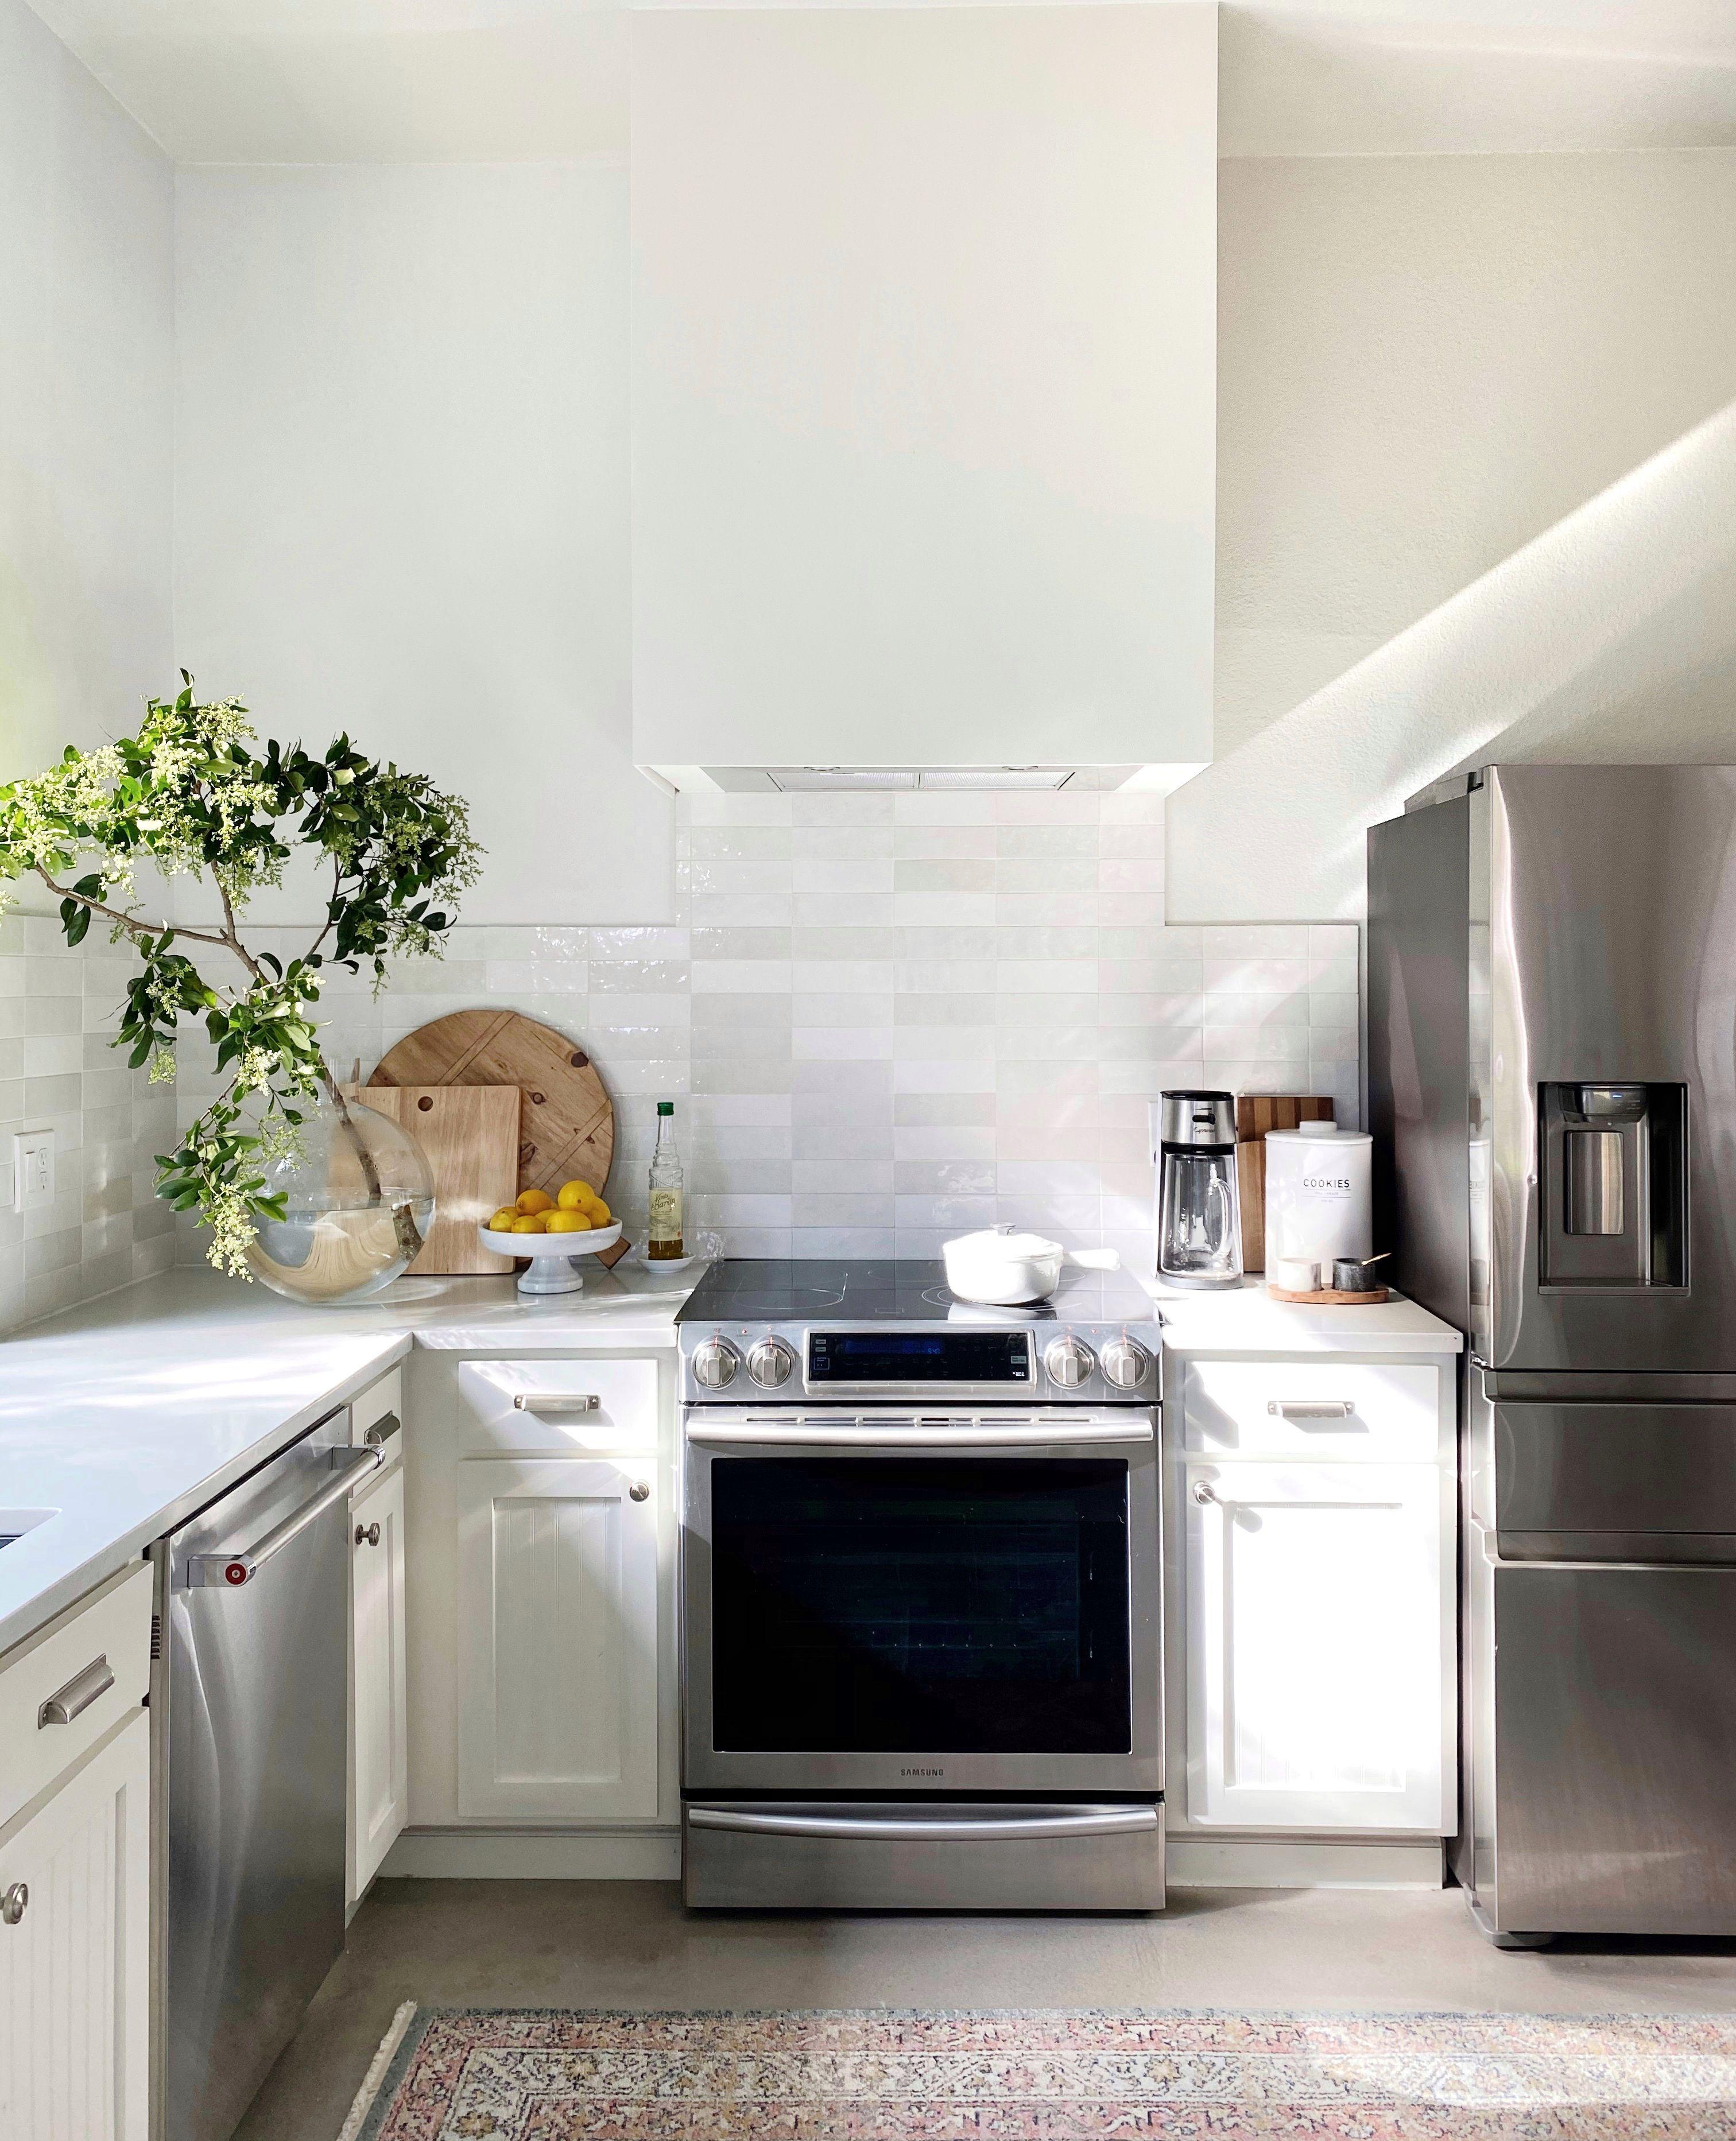 Kitchen Design In White Kitchen Design U Shape White Kitchen Design Kitchen Design Virtual Kitchen Design Tool Ikea In 2020 Home Appliances Kitchen Stoves Range